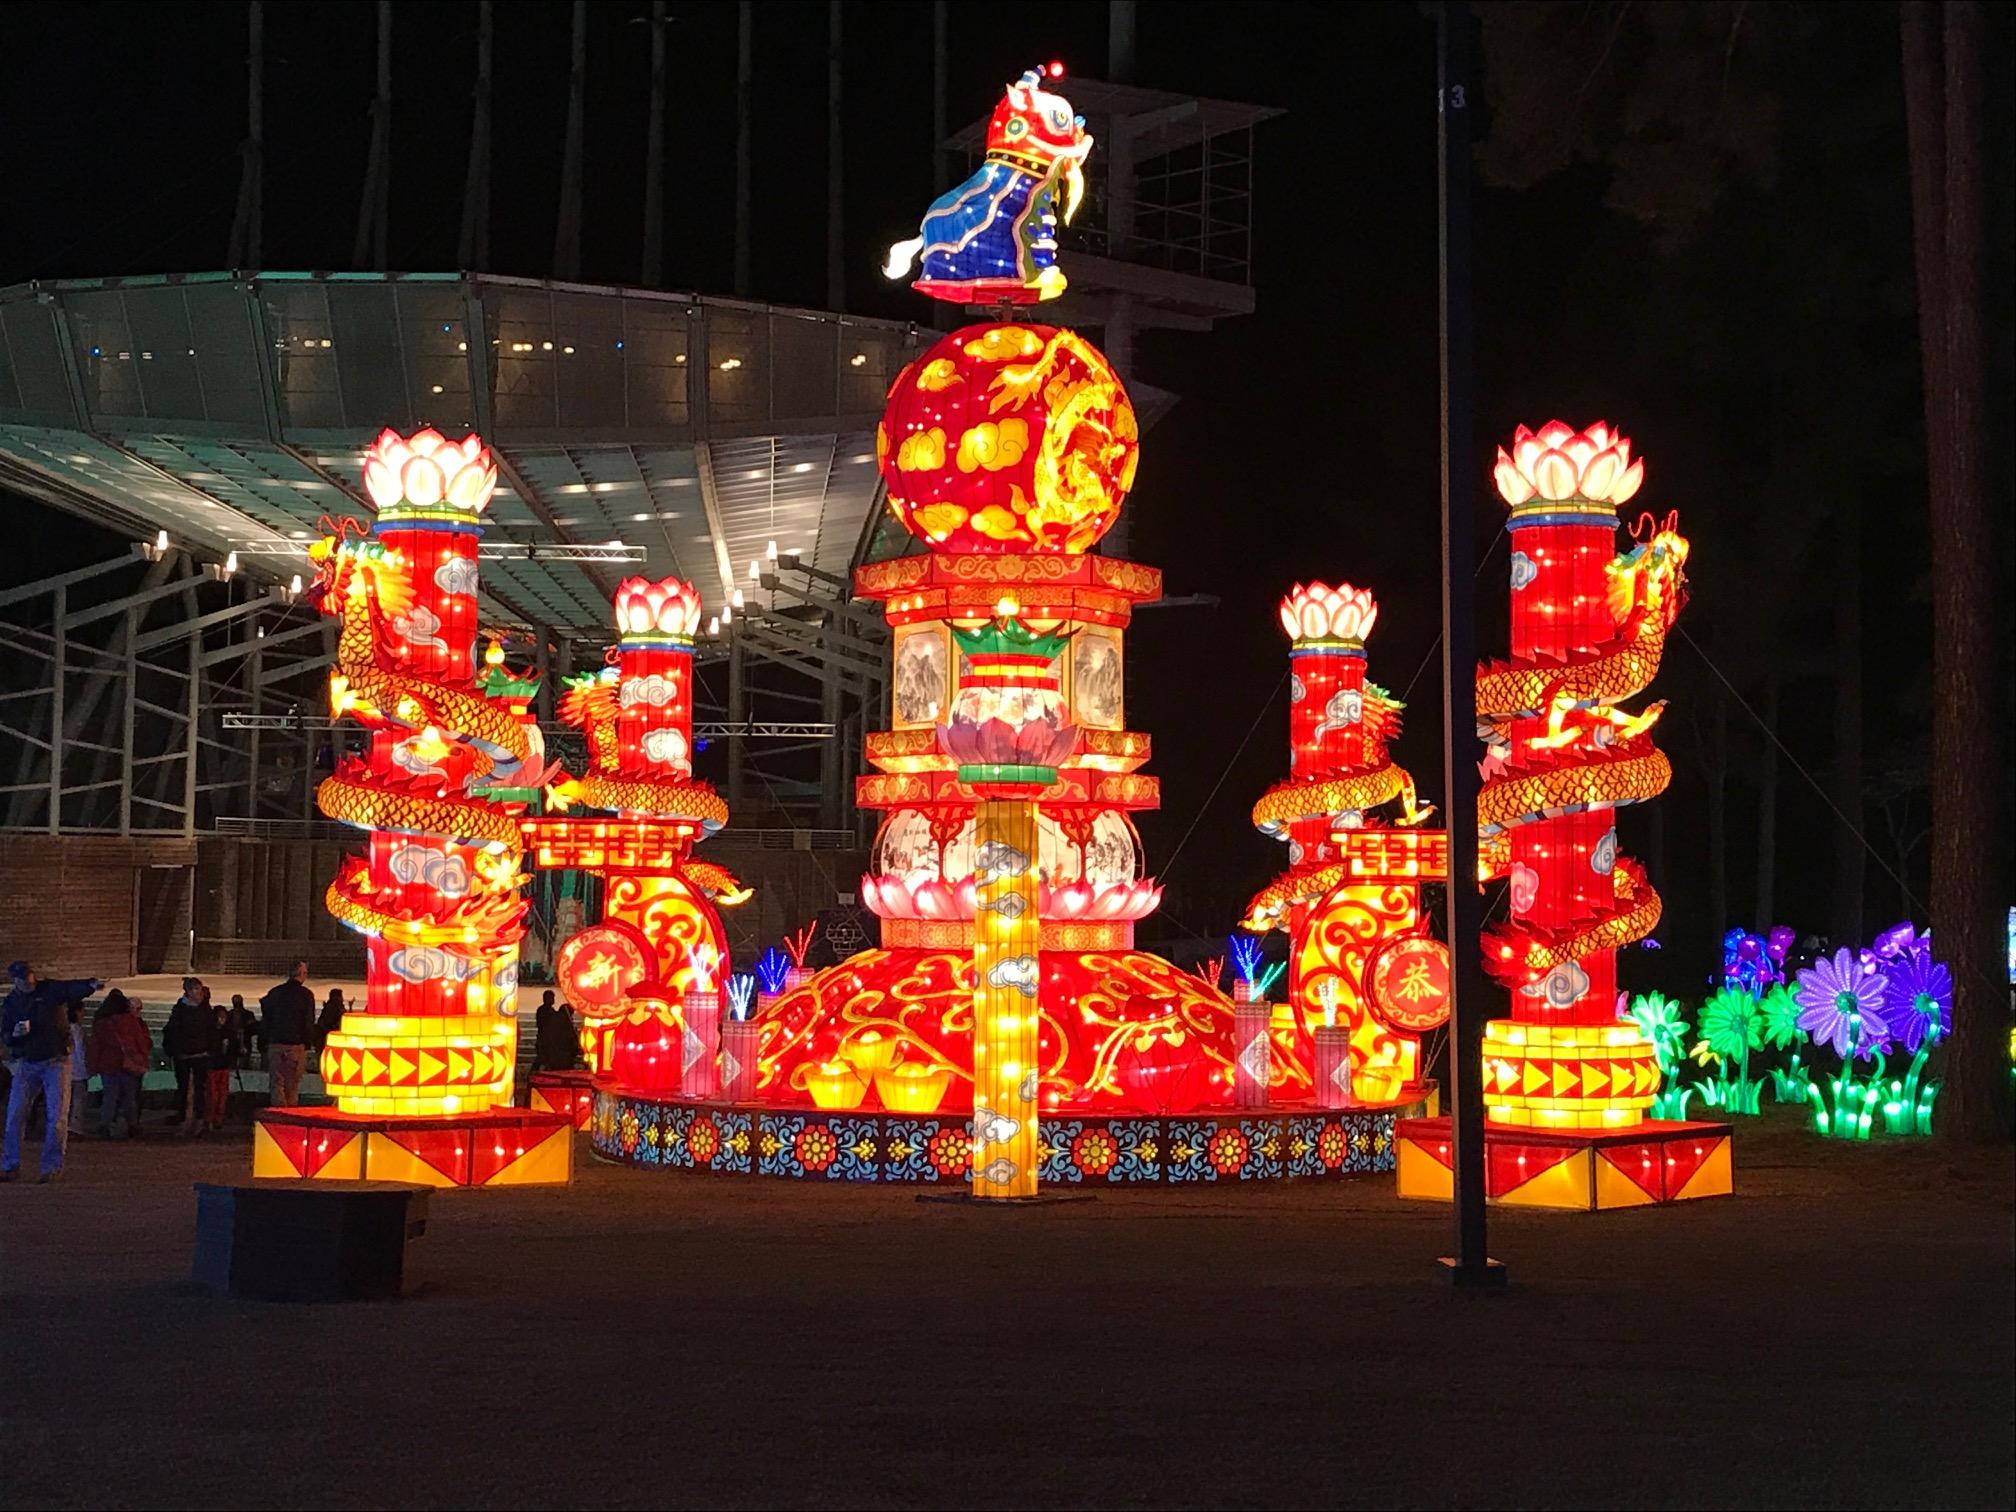 "<div class=""meta image-caption""><div class=""origin-logo origin-image none""><span>none</span></div><span class=""caption-text"">NC Chinese Lantern Festival</span></div>"